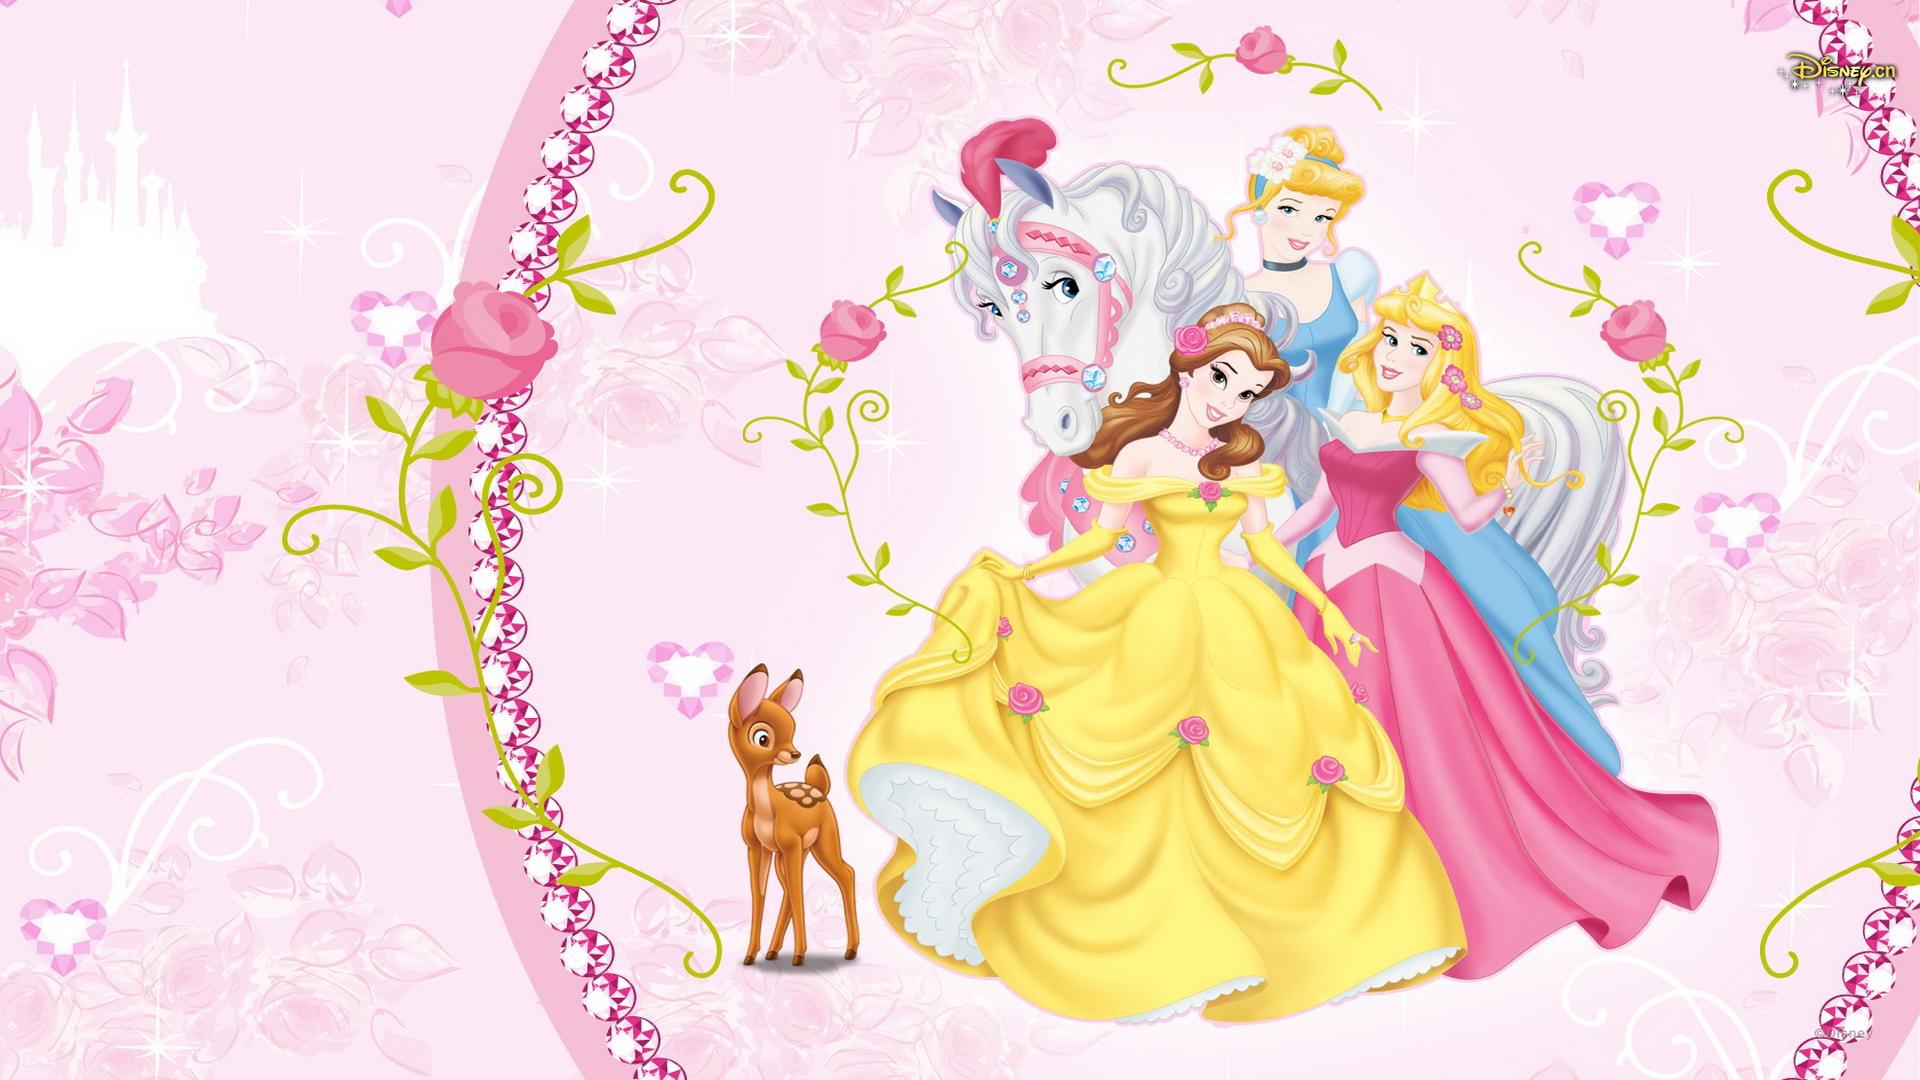 Download Disney Princess Christmas Wallpaper Full HD Wallpapers 1920x1080